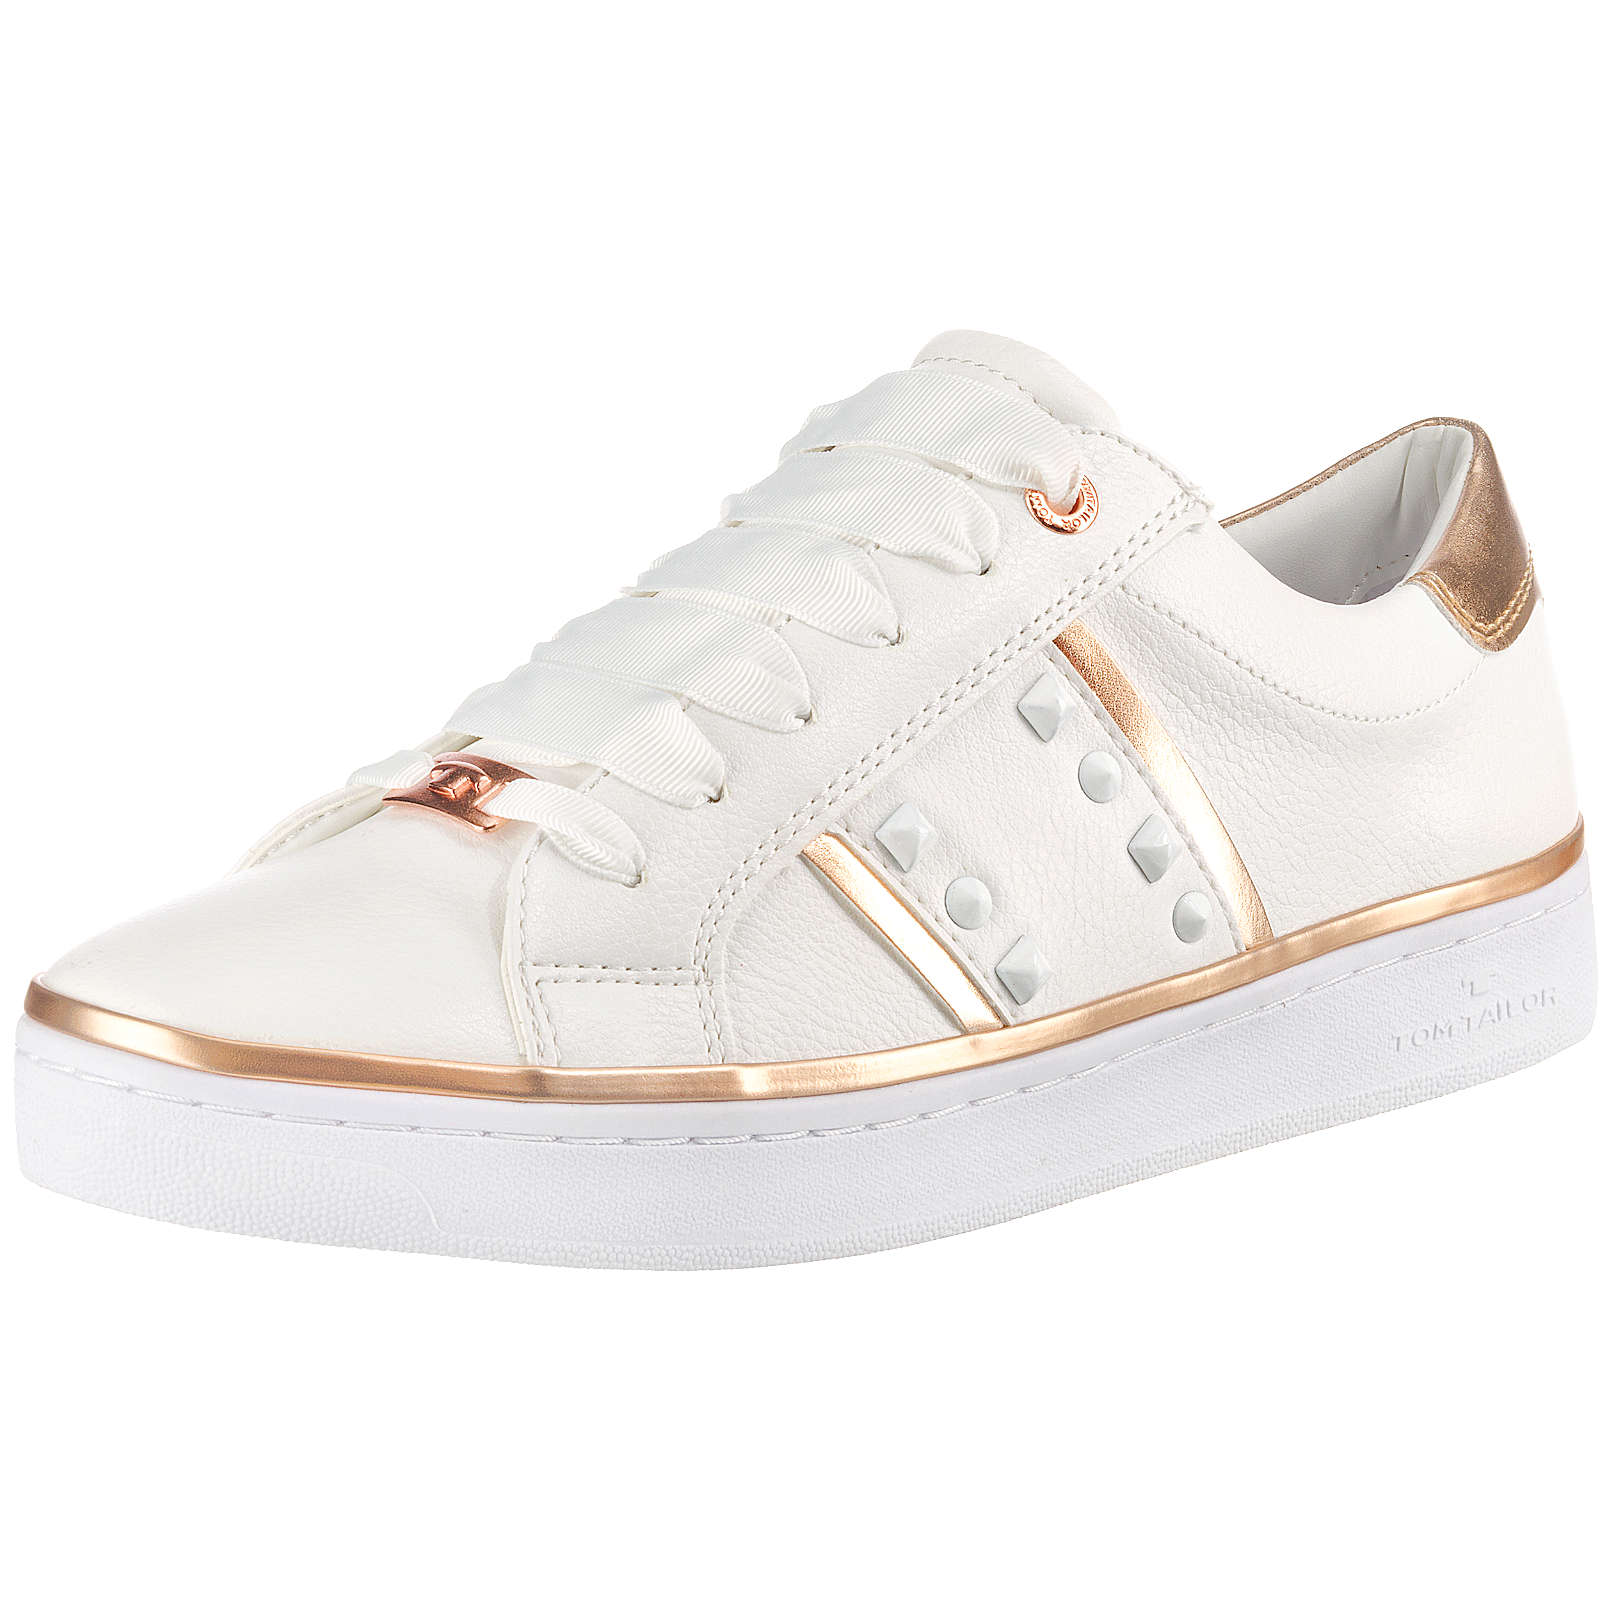 TOM TAILOR Sneakers Low weiß Damen Gr. 37